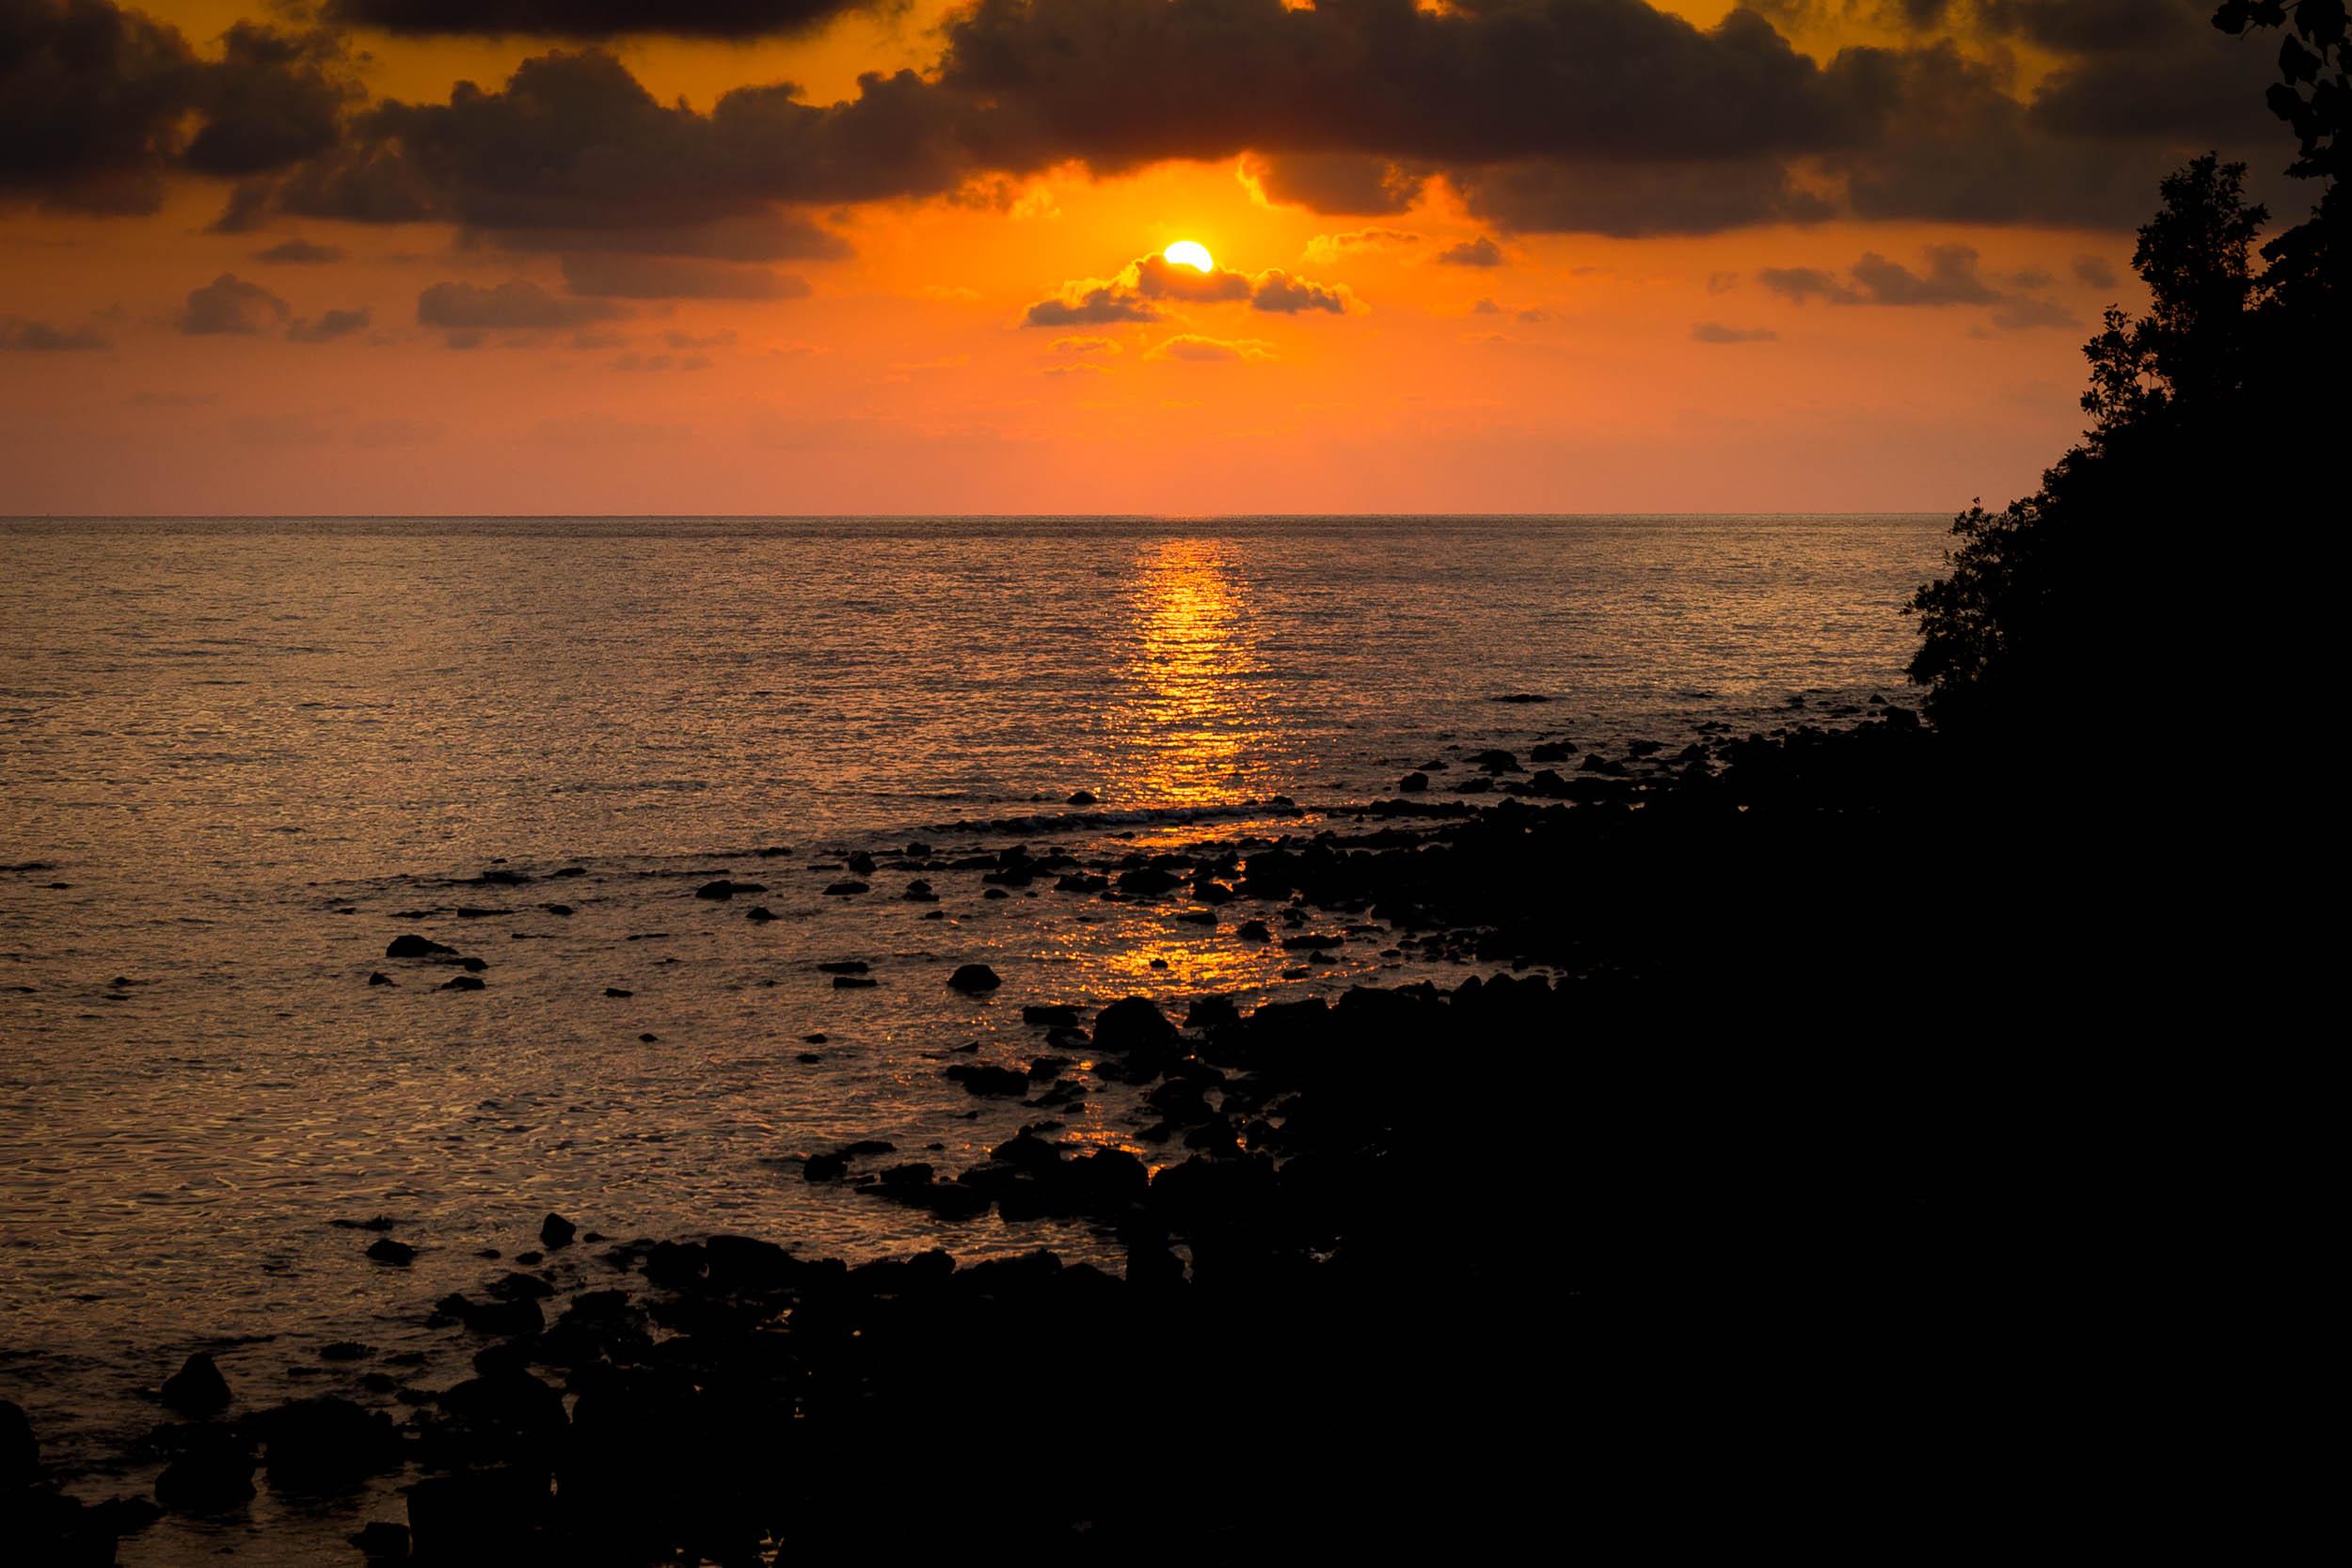 Rupert Turkington Travel Photography - Sunset at Paradis Cottage, Koh Chang Island, Thailand.